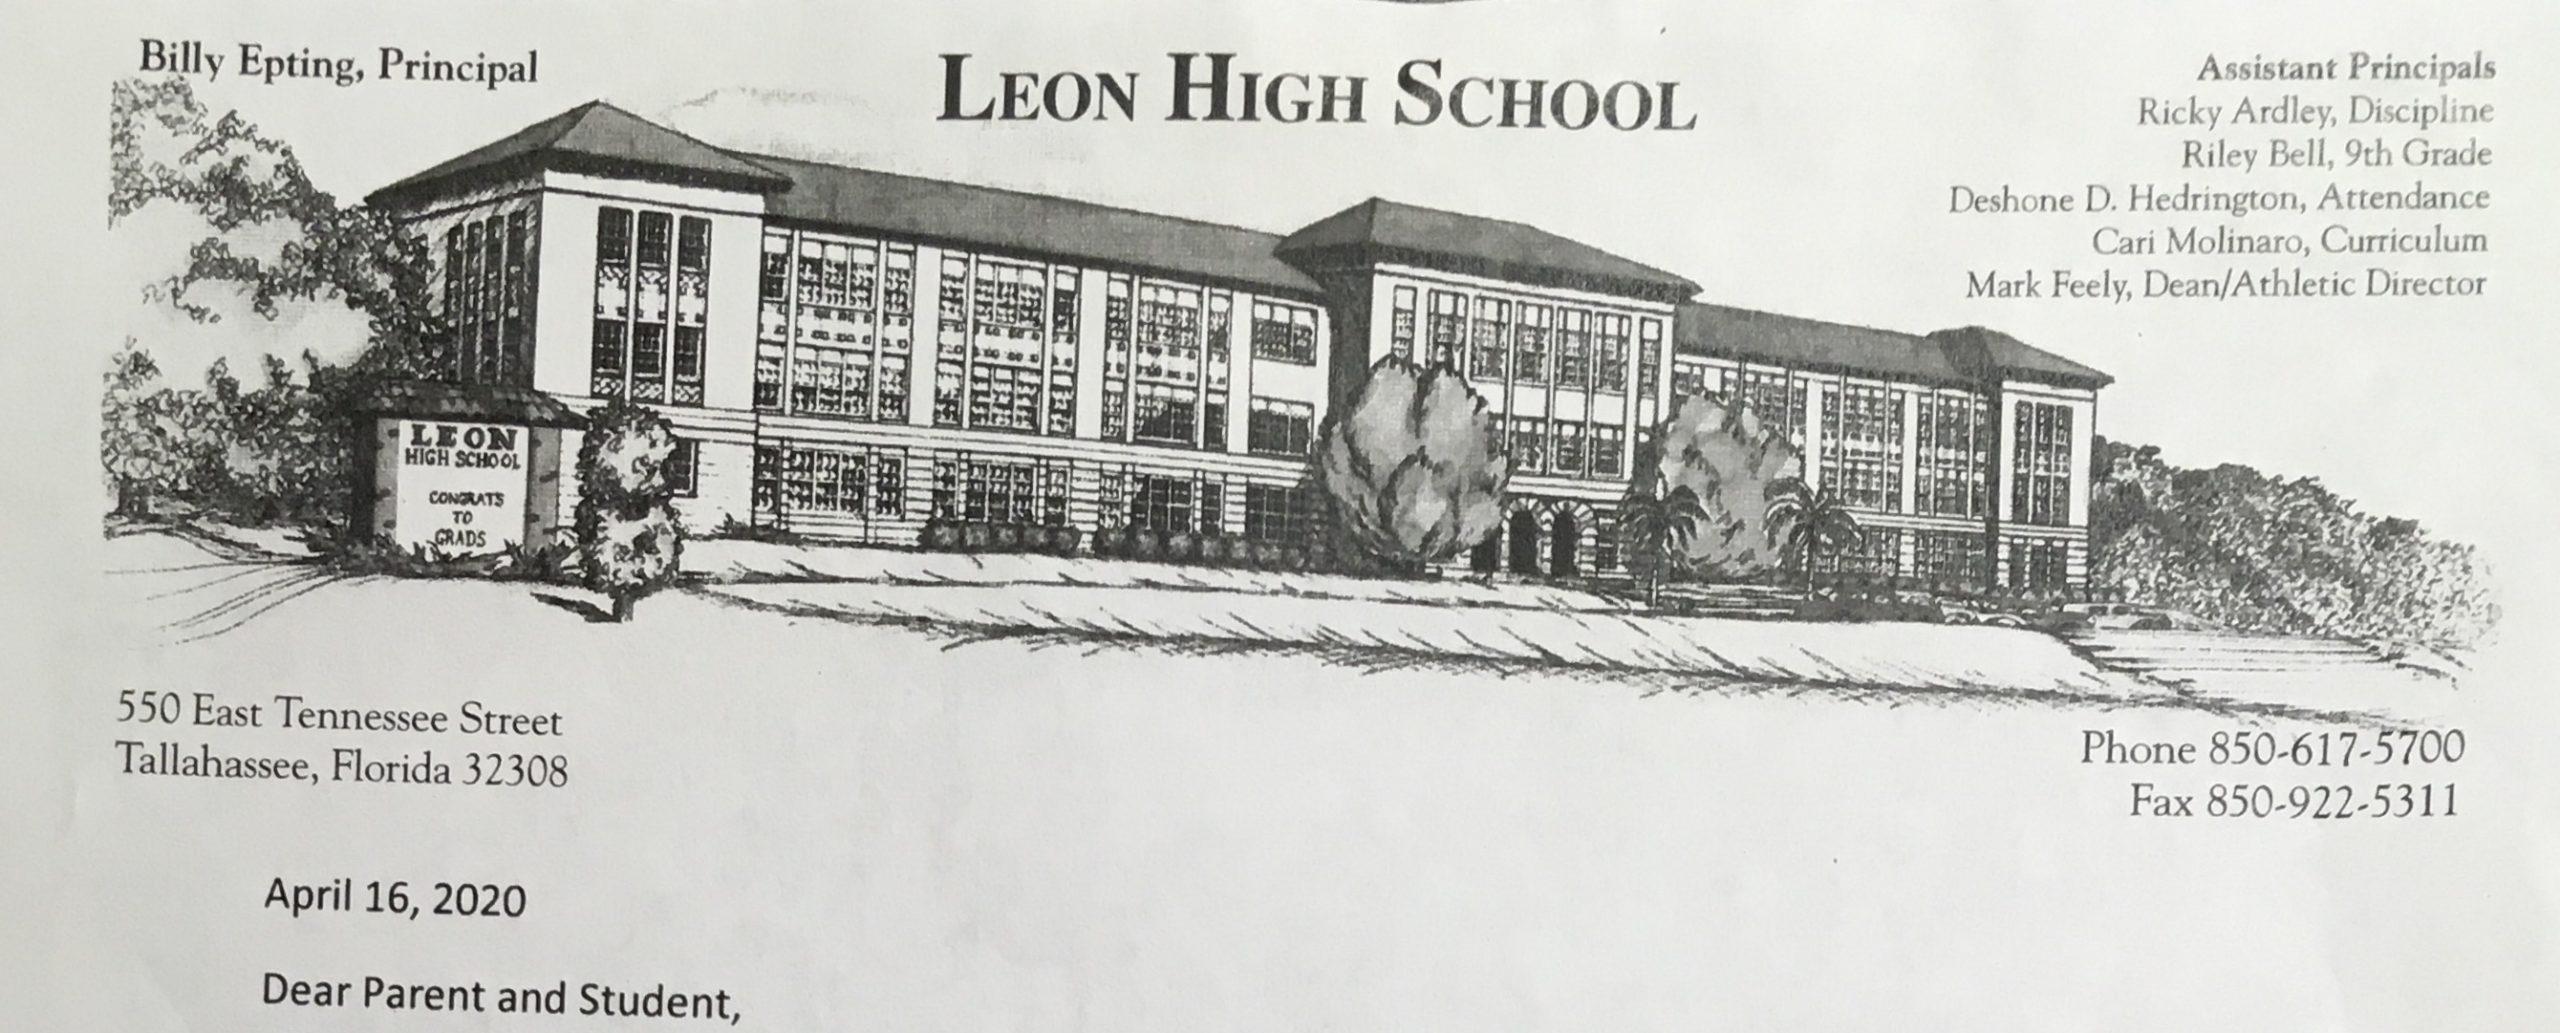 Leon High School Masthead